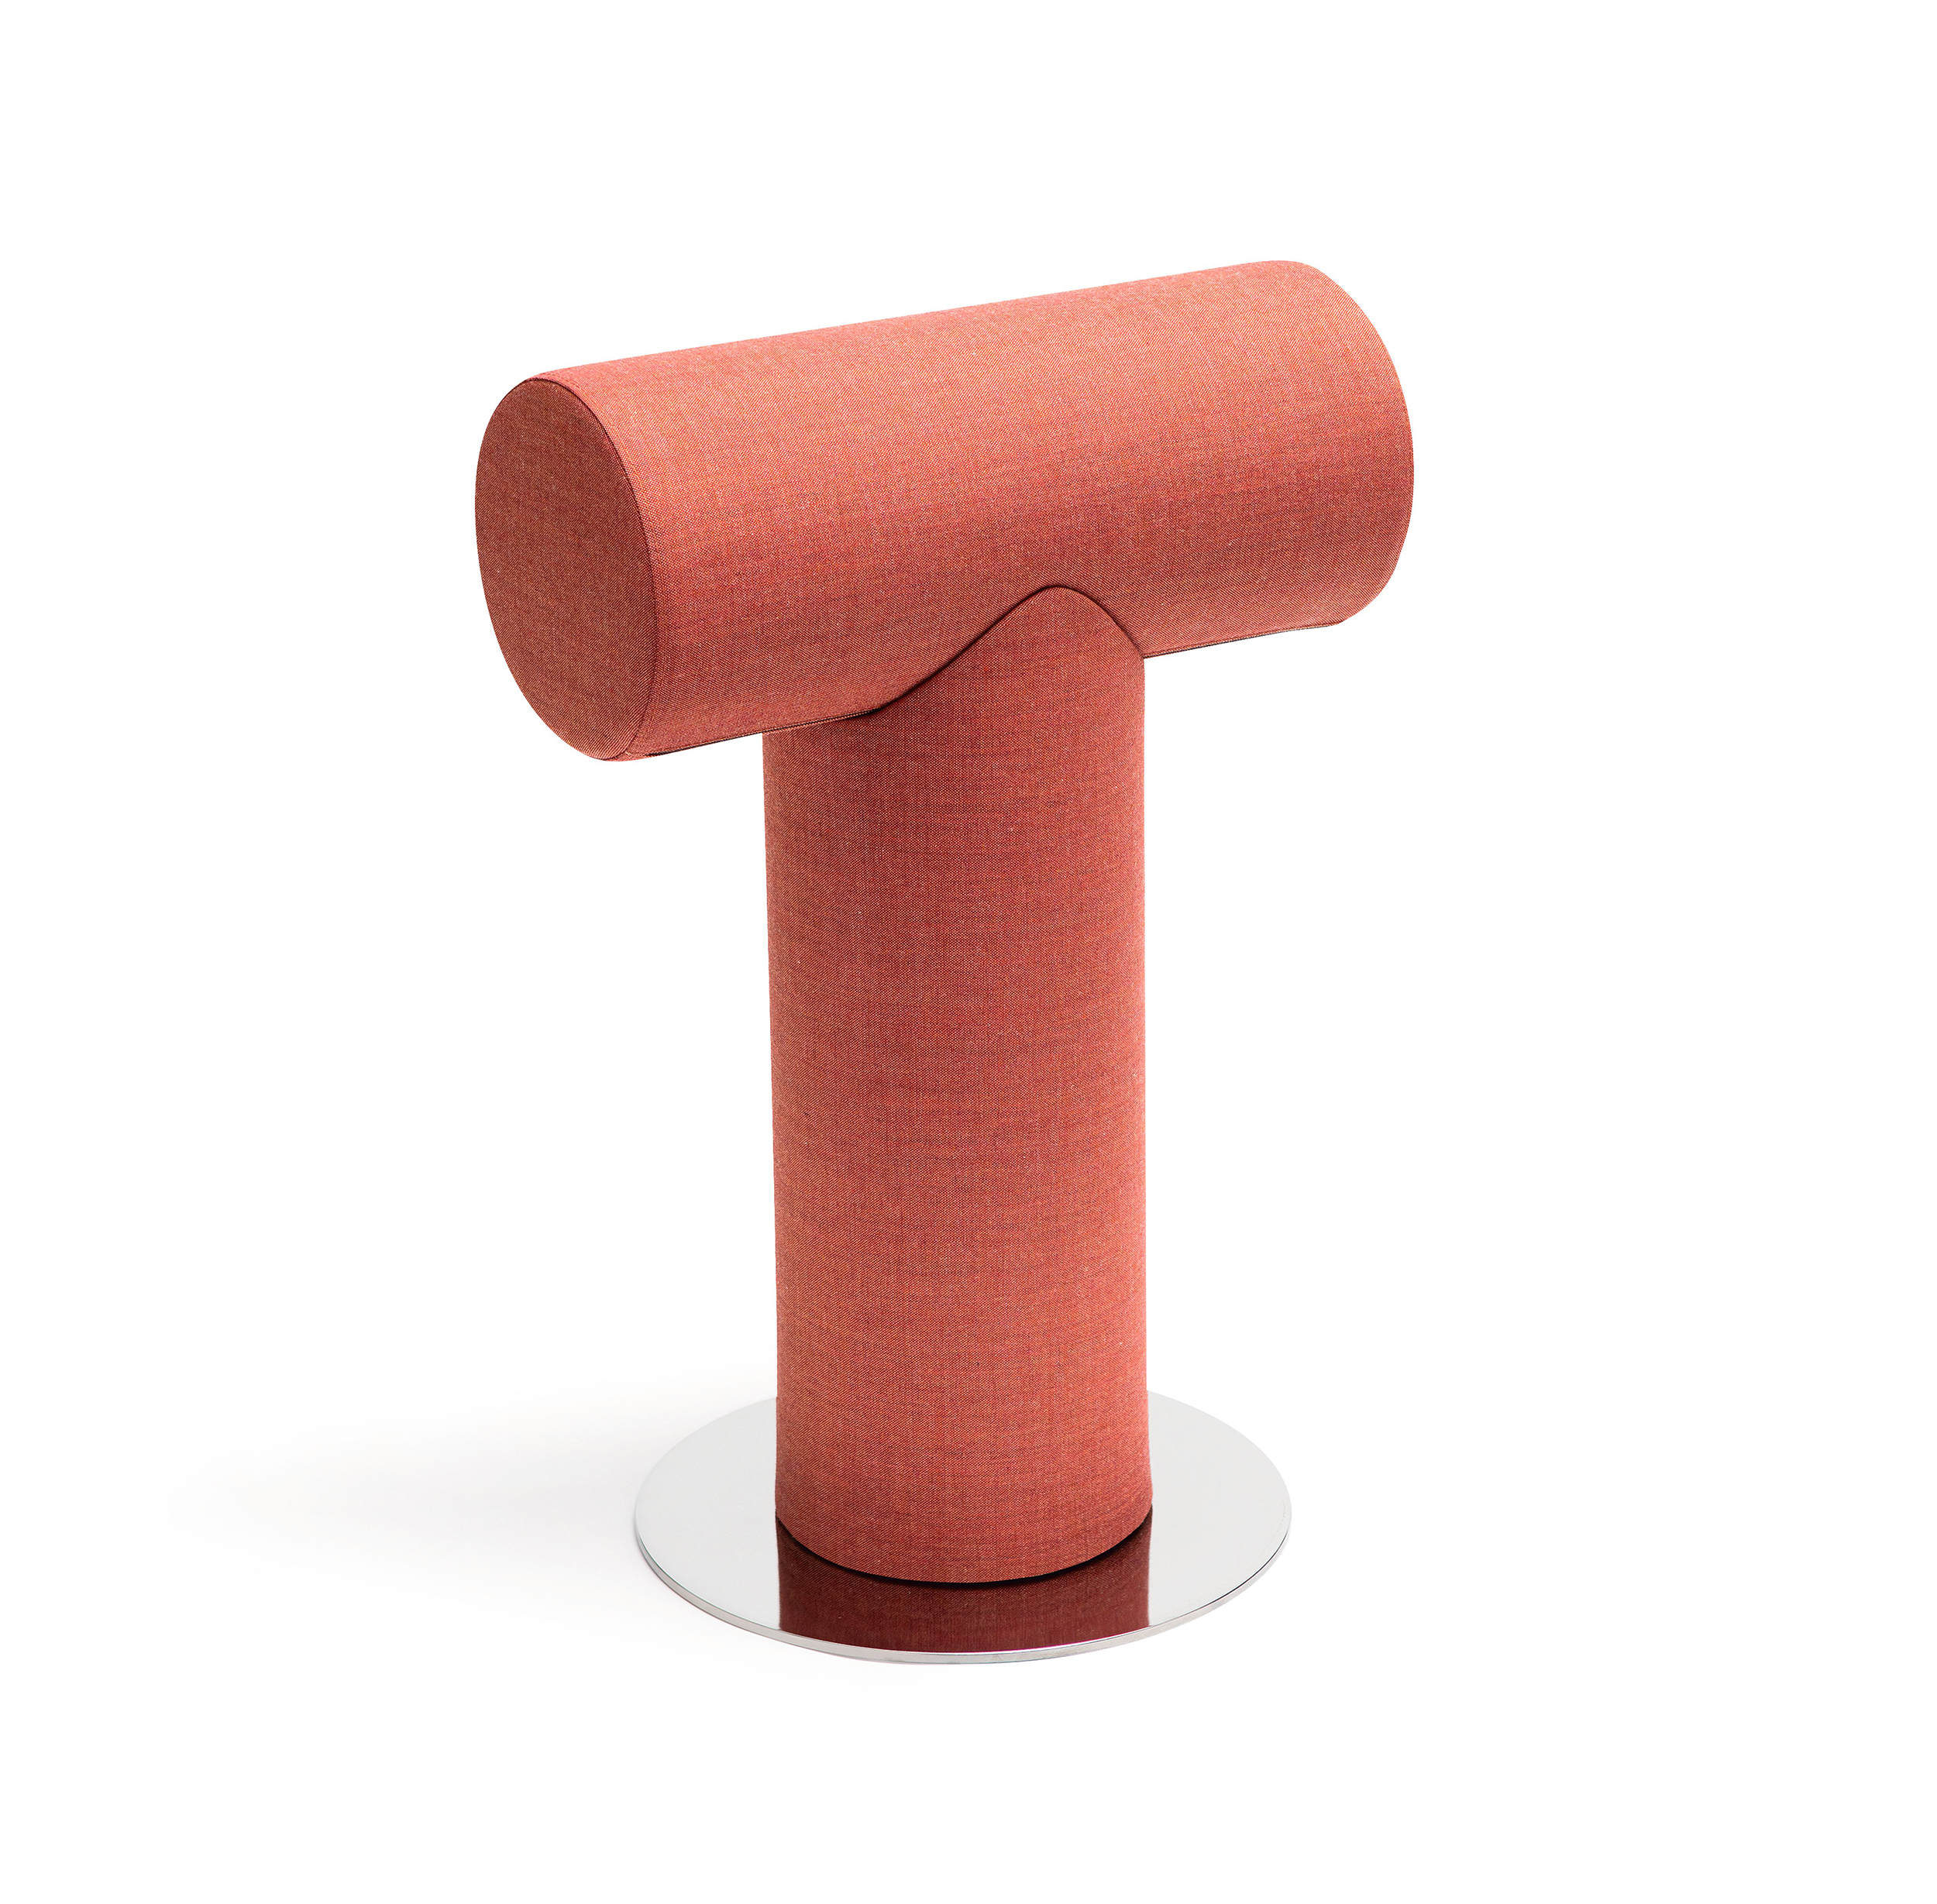 MATERIA-Mr-T-stool-h660-red.jpg